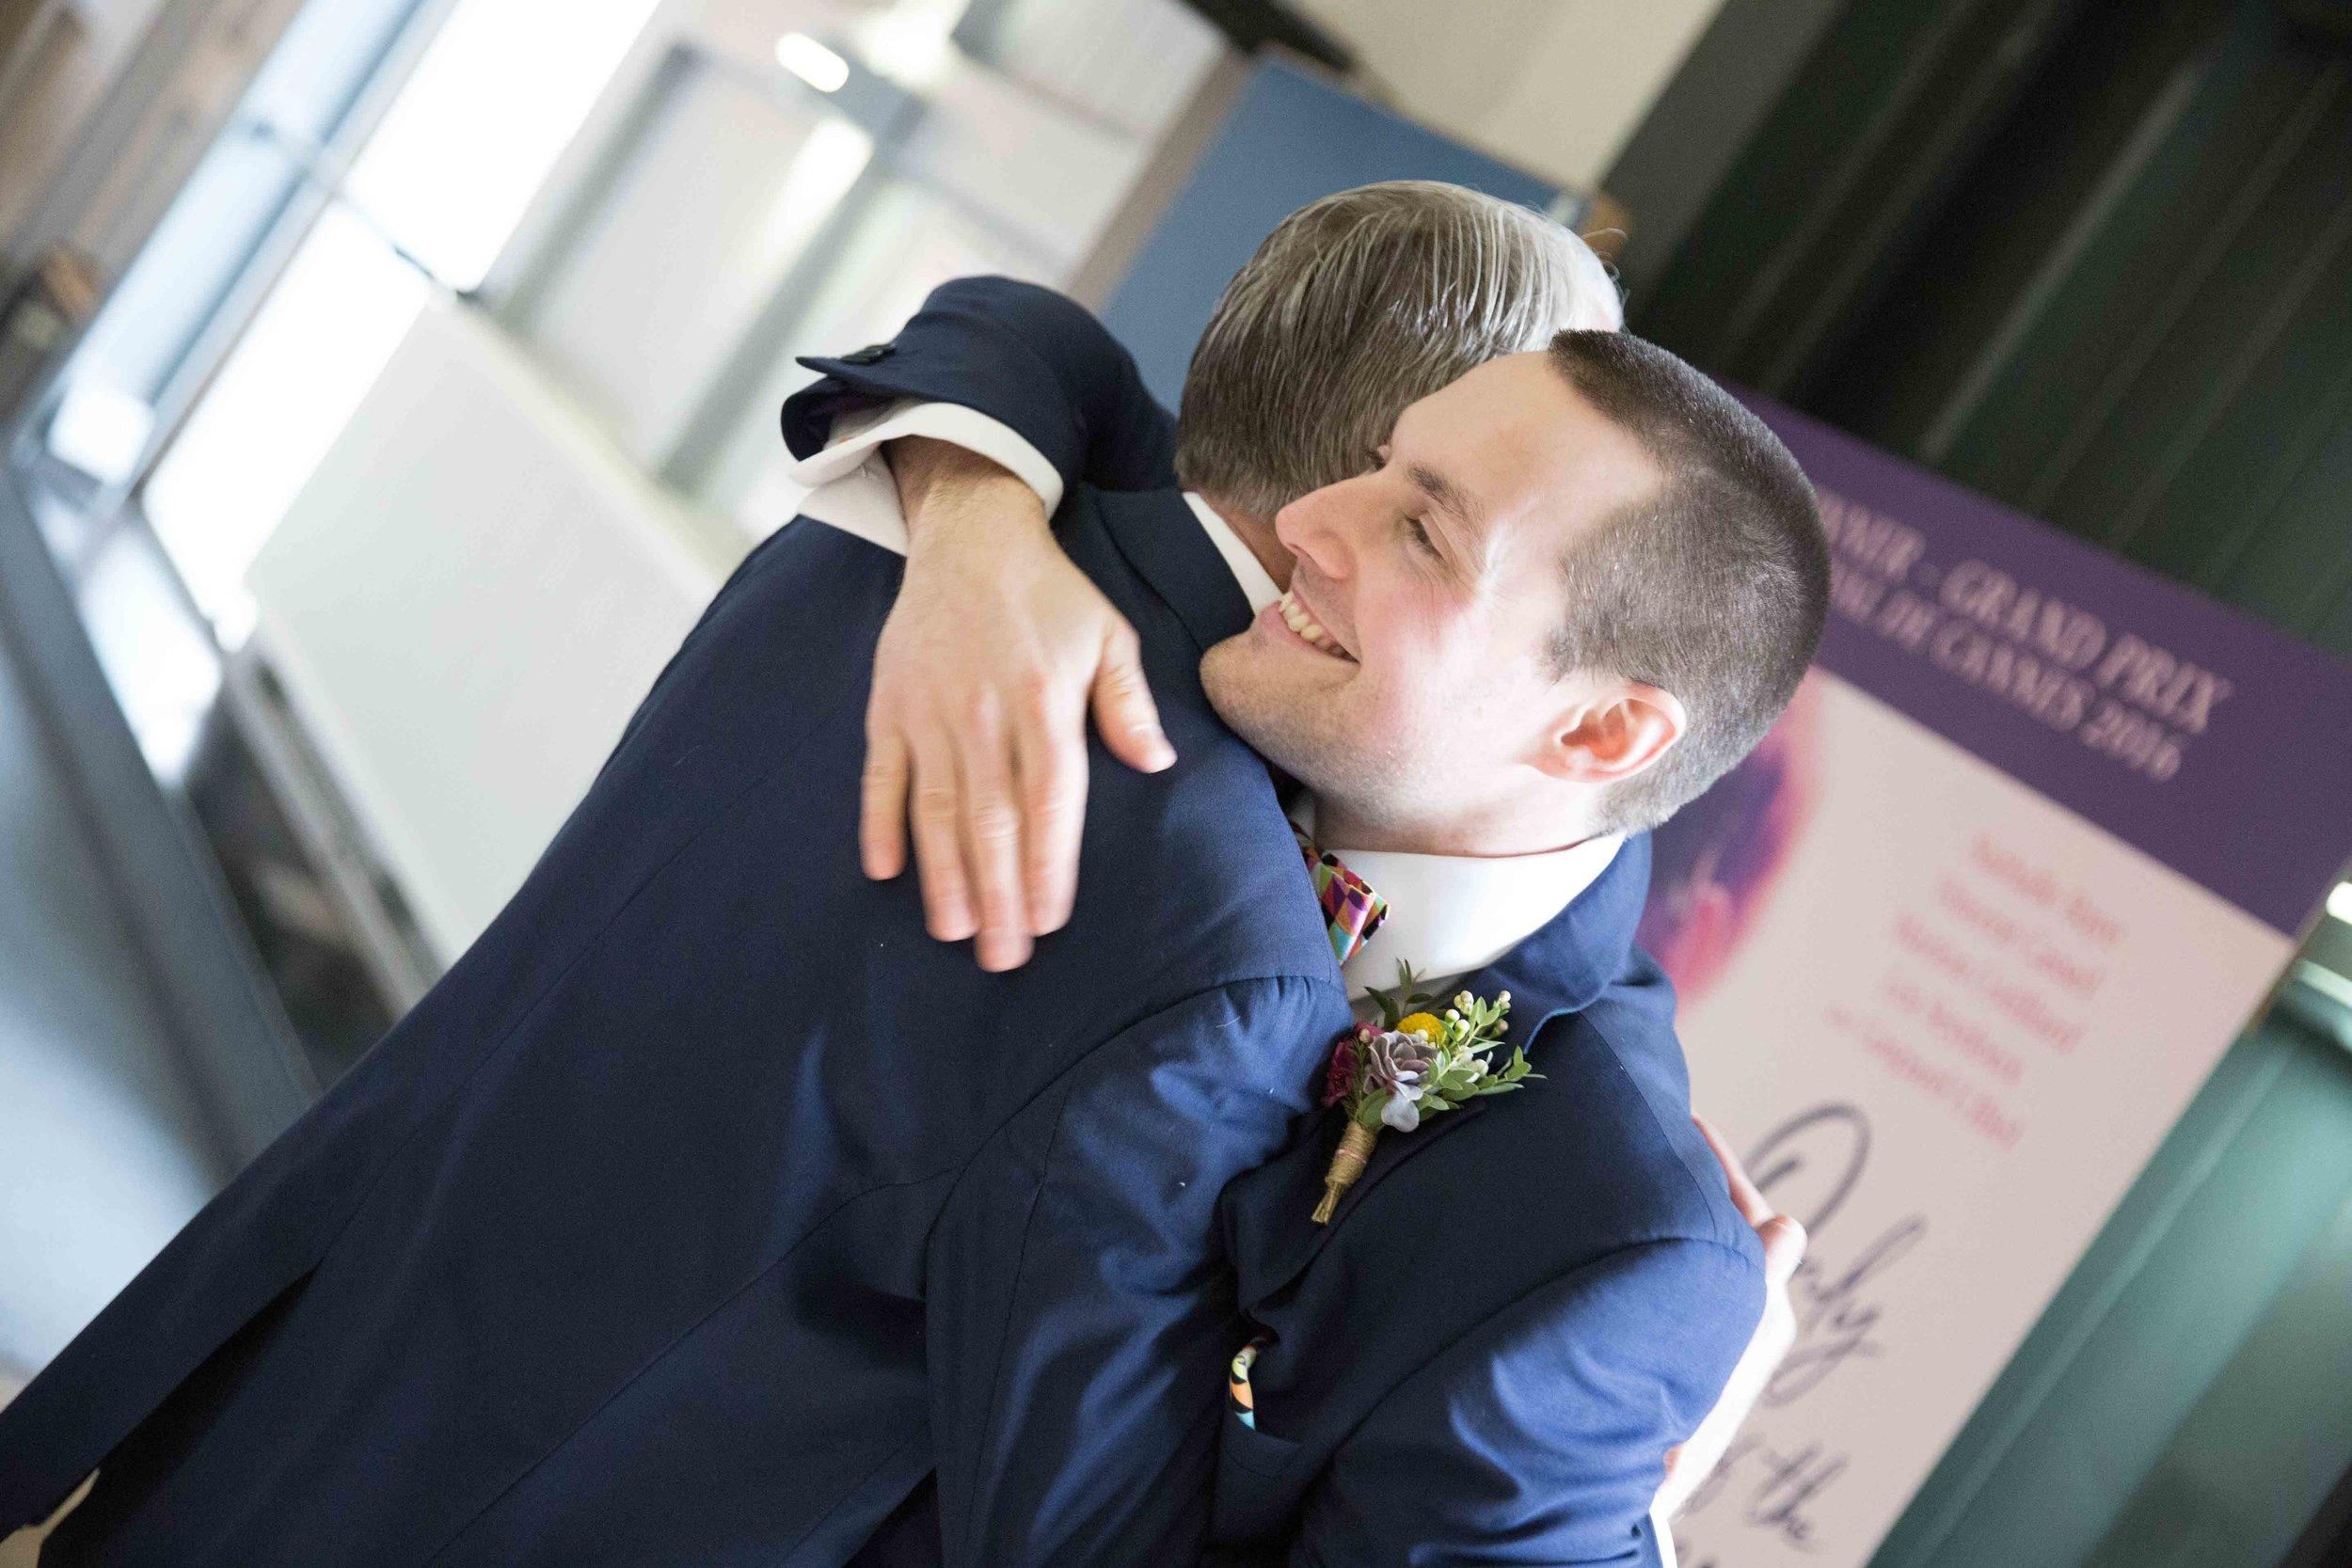 Adam & Faye - Wright Wedding Photography - Bristol Wedding Photographer -39.jpg